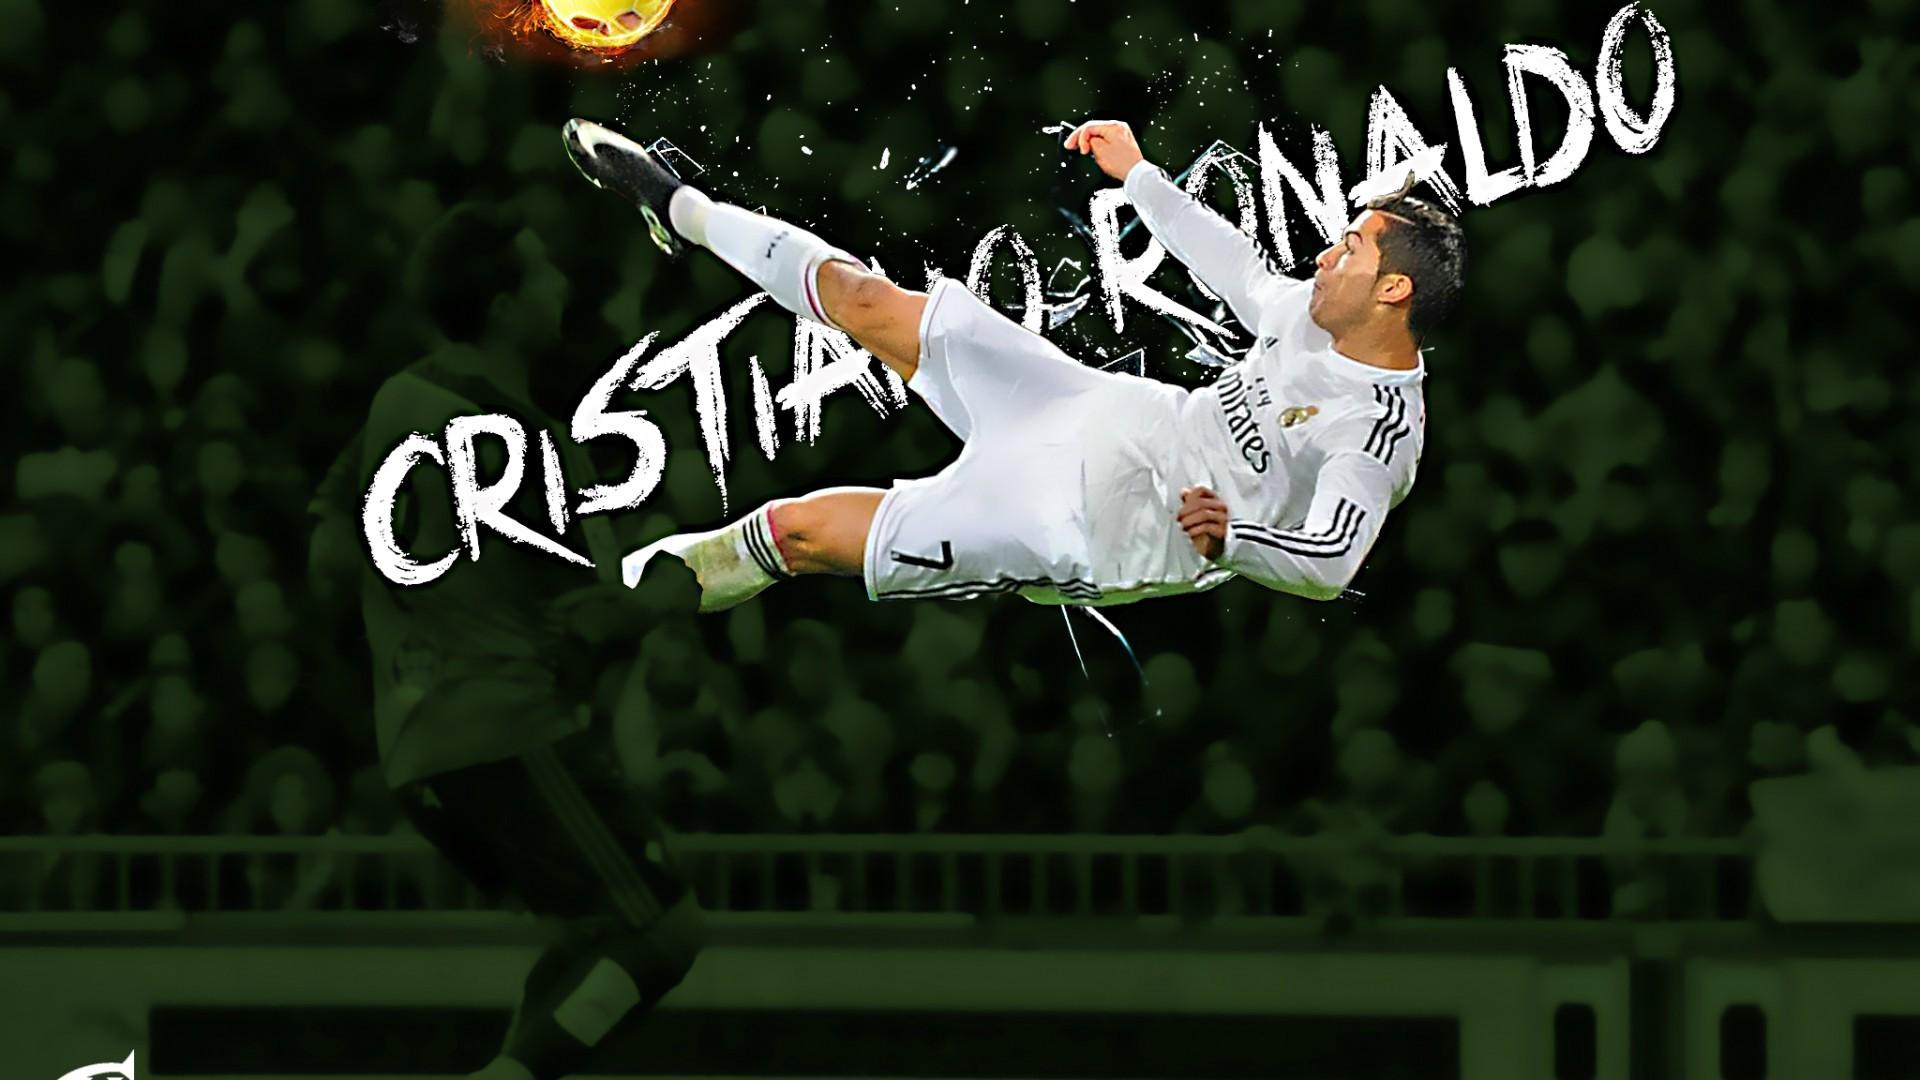 Download Cristiano Ronaldo CR7 Flying Shot Football HD Wallpaper .